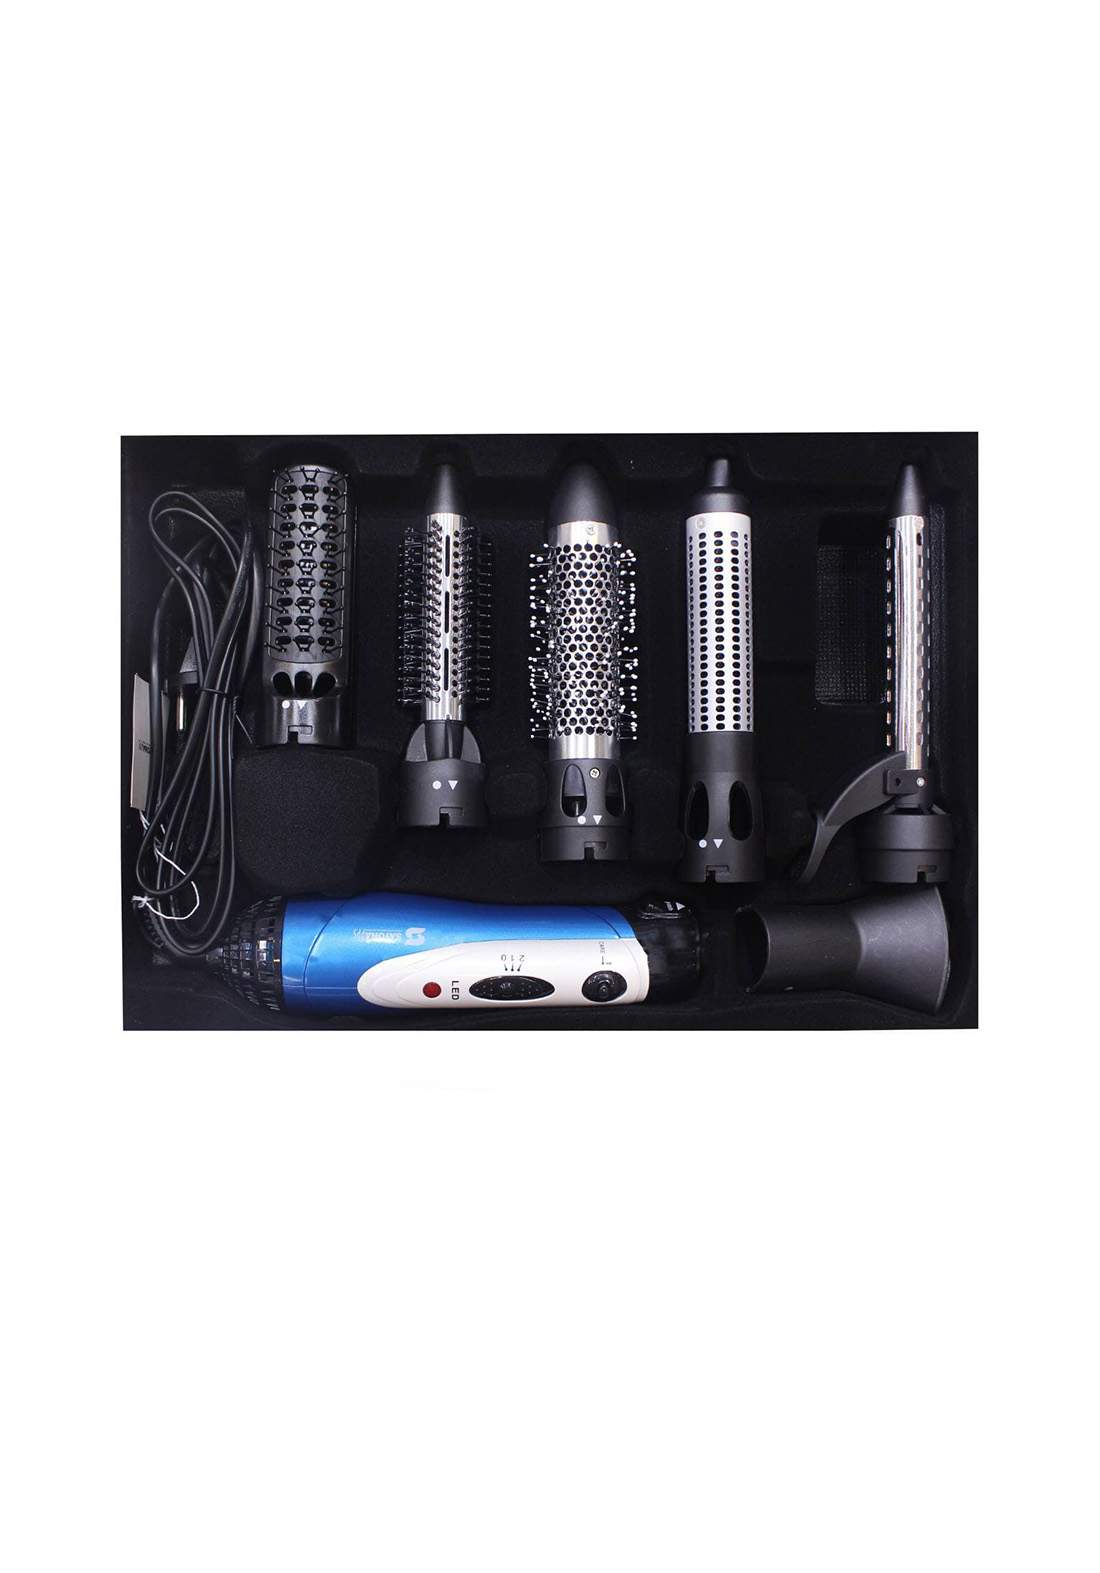 Sayona 800 Hair dryer (8 in 1) 1000 Watt  مجفف شعر